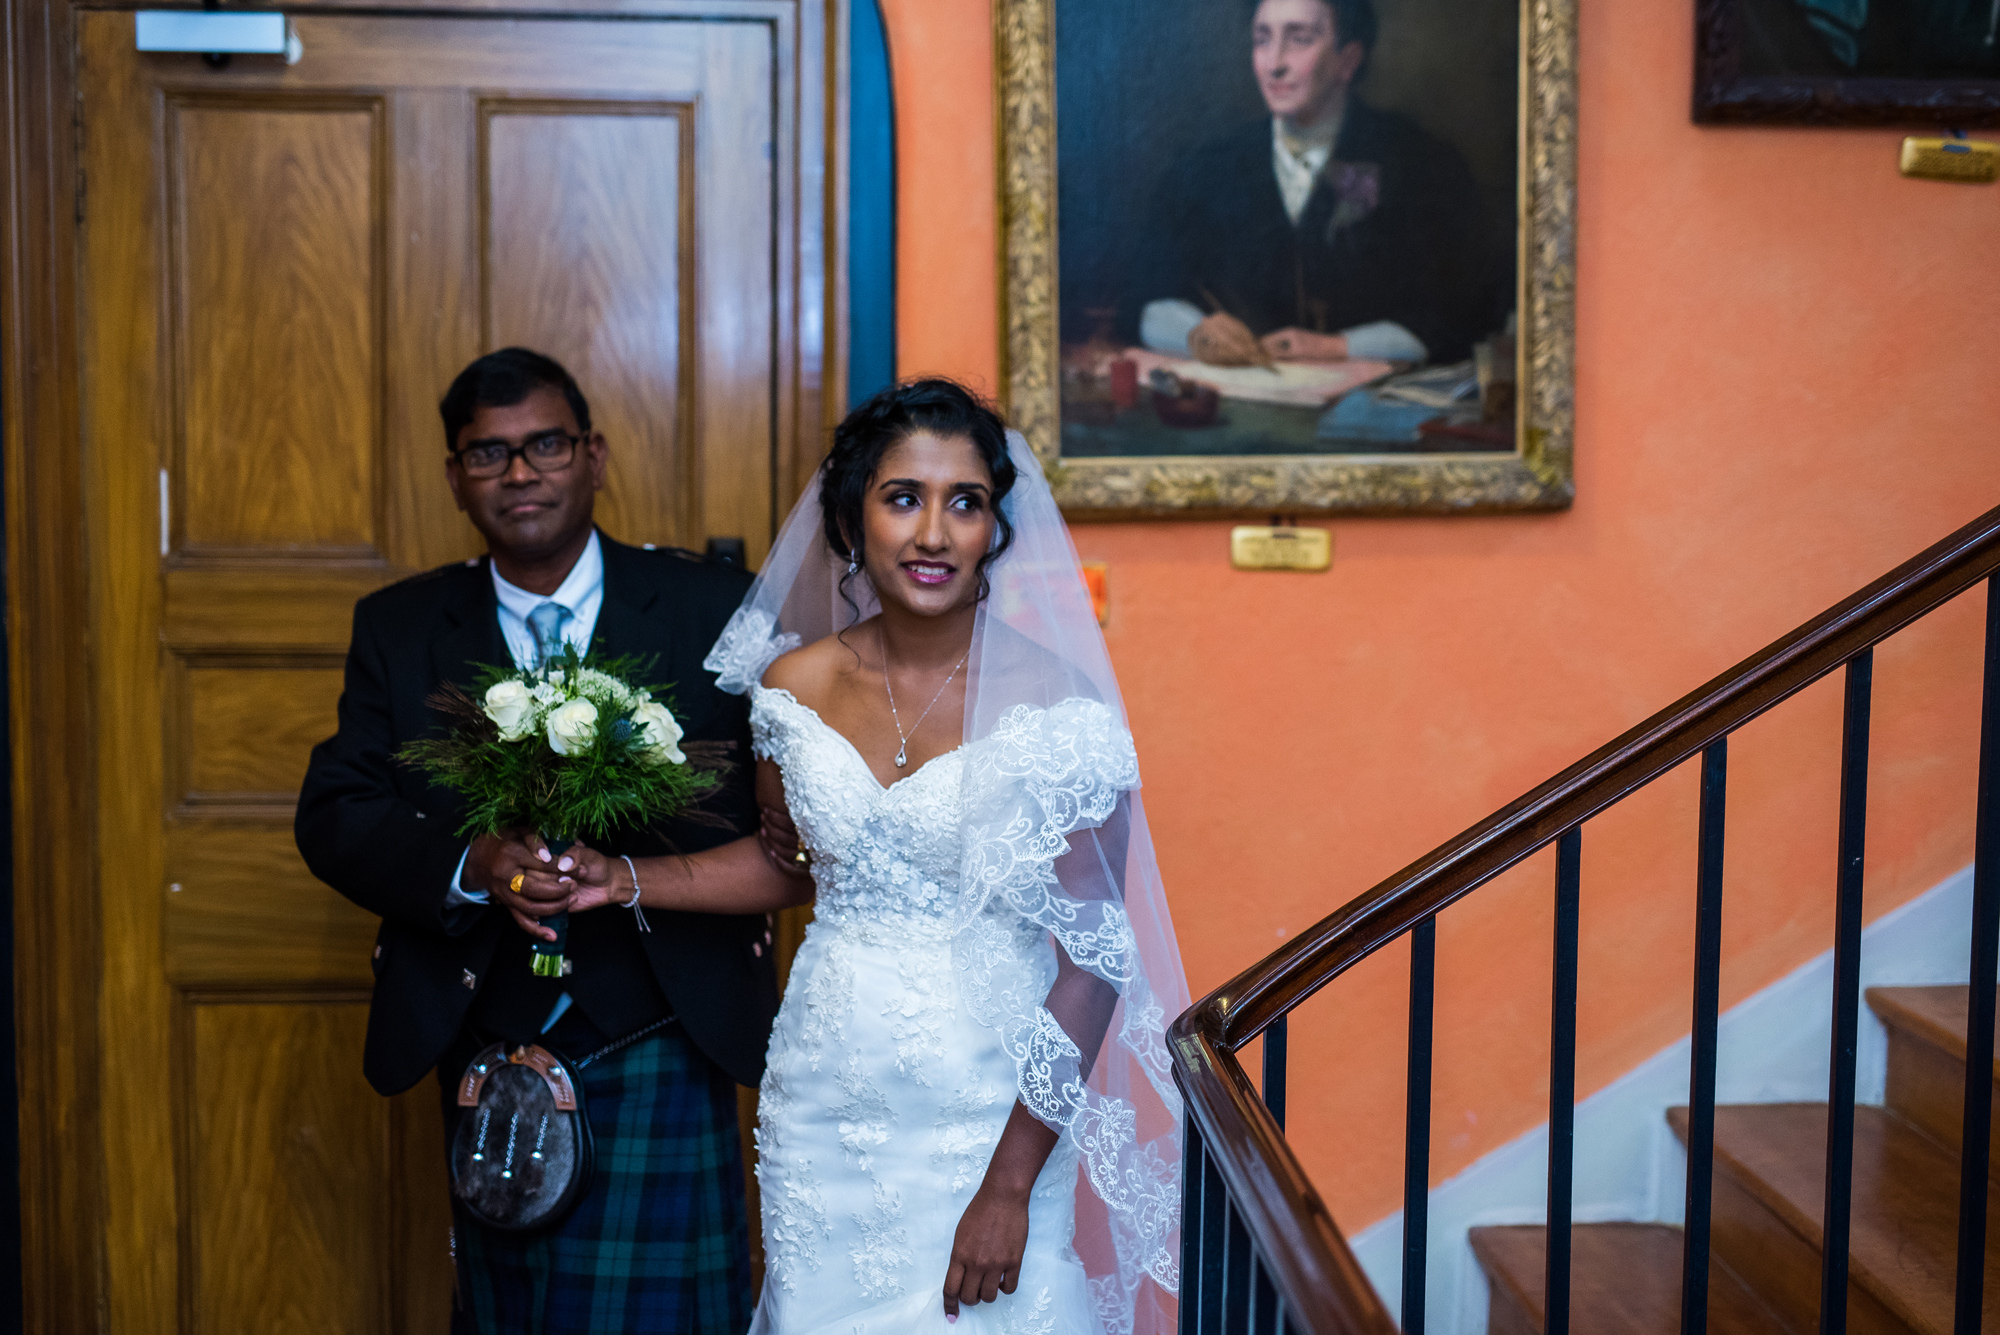 Kev and Shrabani wedding photos (107 of 350).jpg